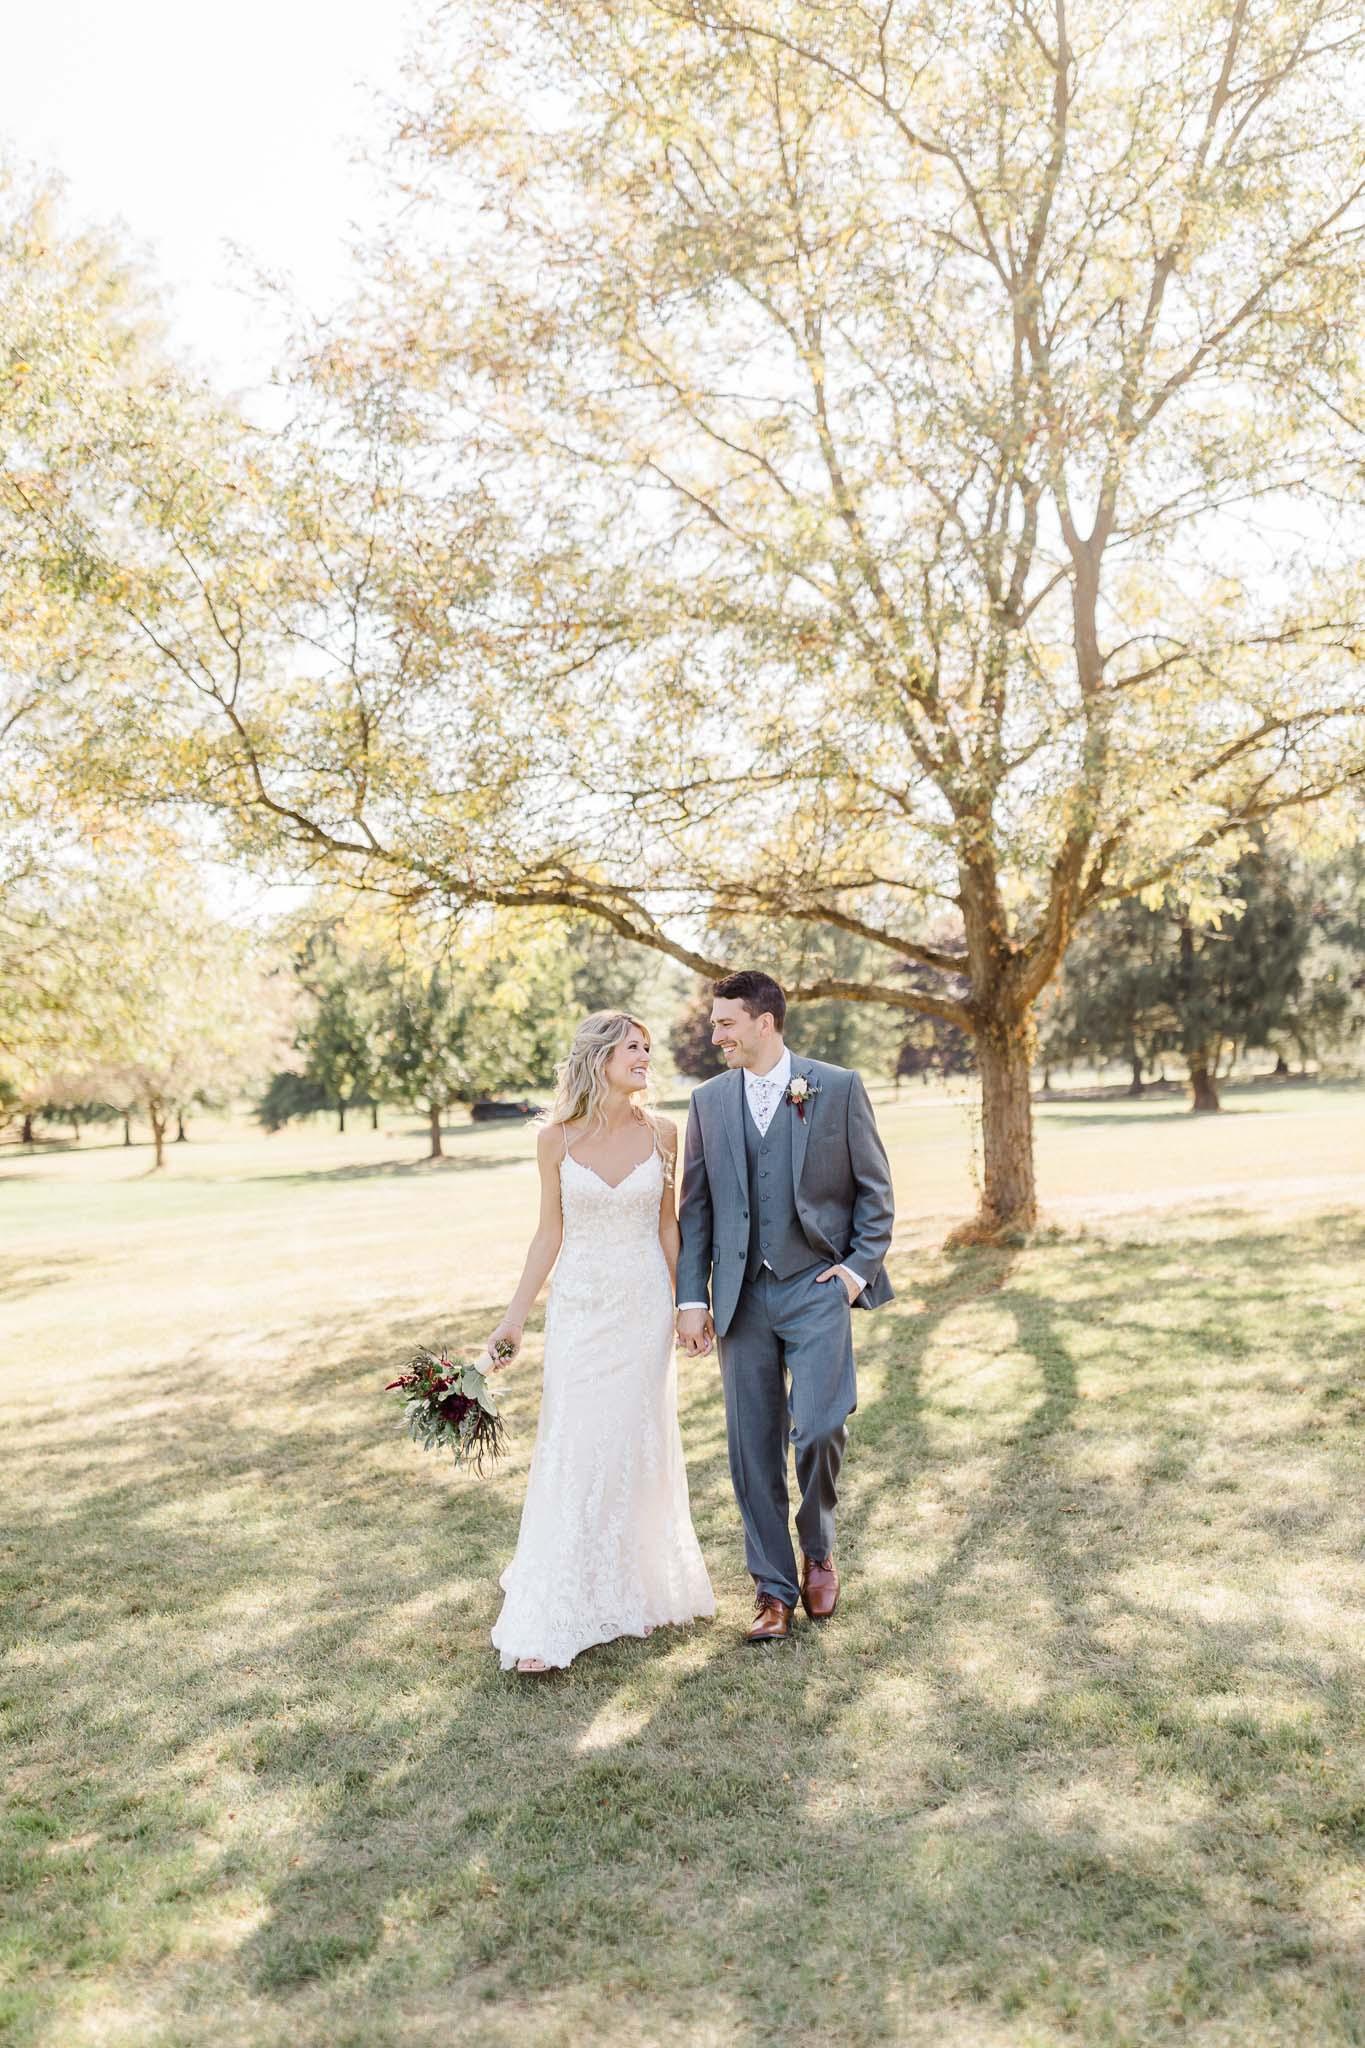 Frosty-Valley-September-Wedding-7660.jpg